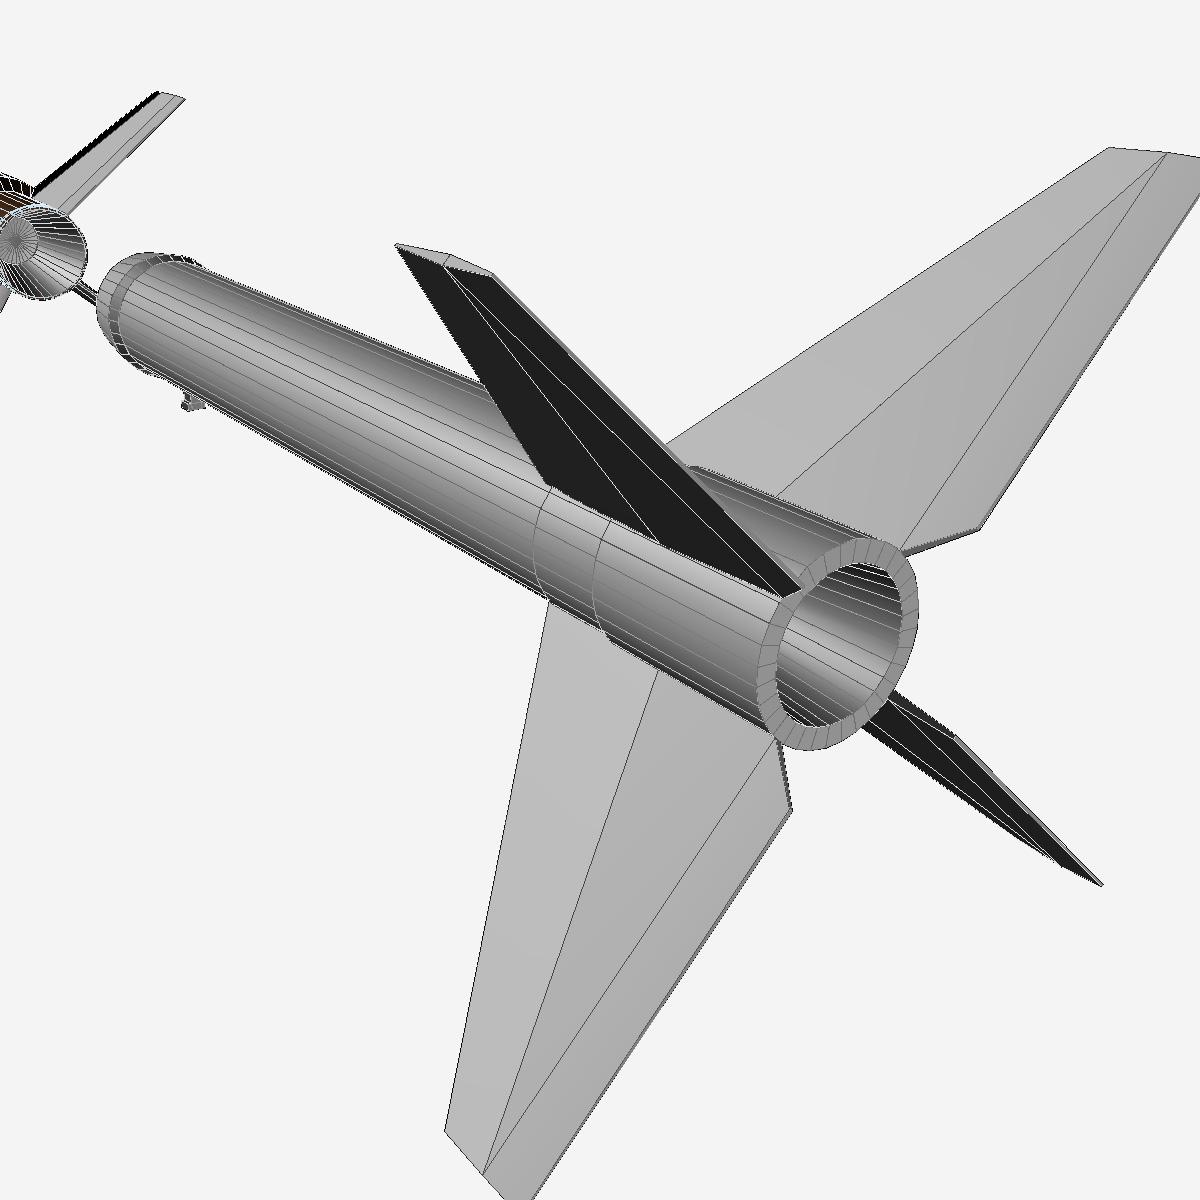 Astrobee 200 Rocket 3d model 3ds dxf fbx blend cob dae X   obj 165957